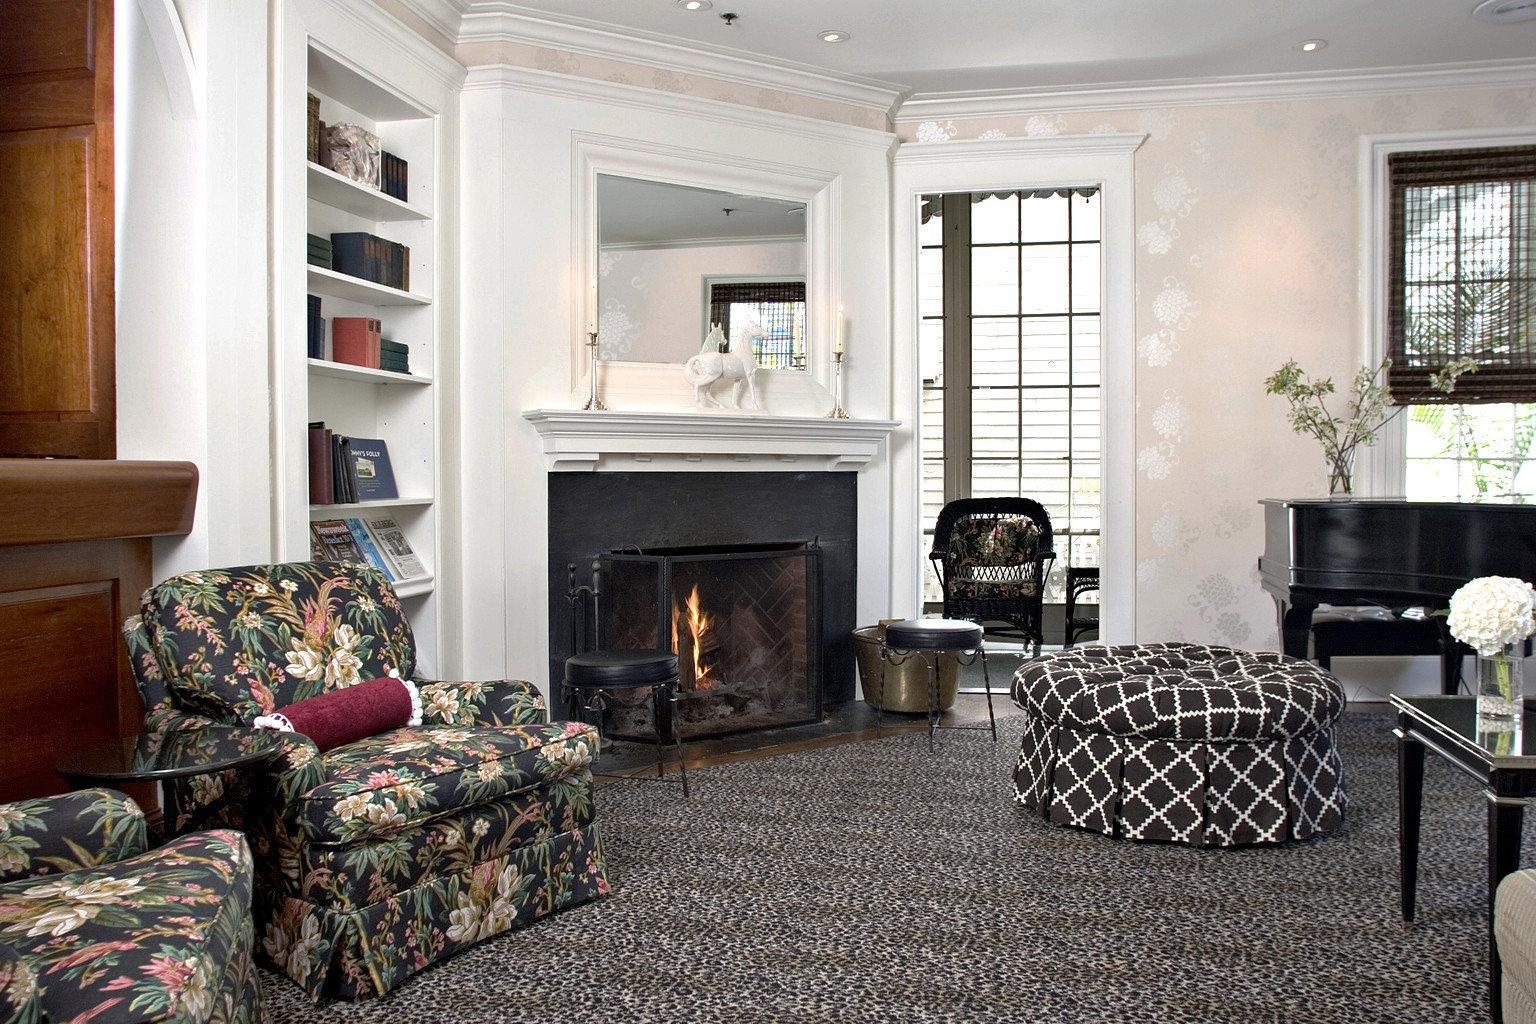 Boutique Fireplace Lounge Modern sofa fire living room property home cottage hardwood Bedroom leather